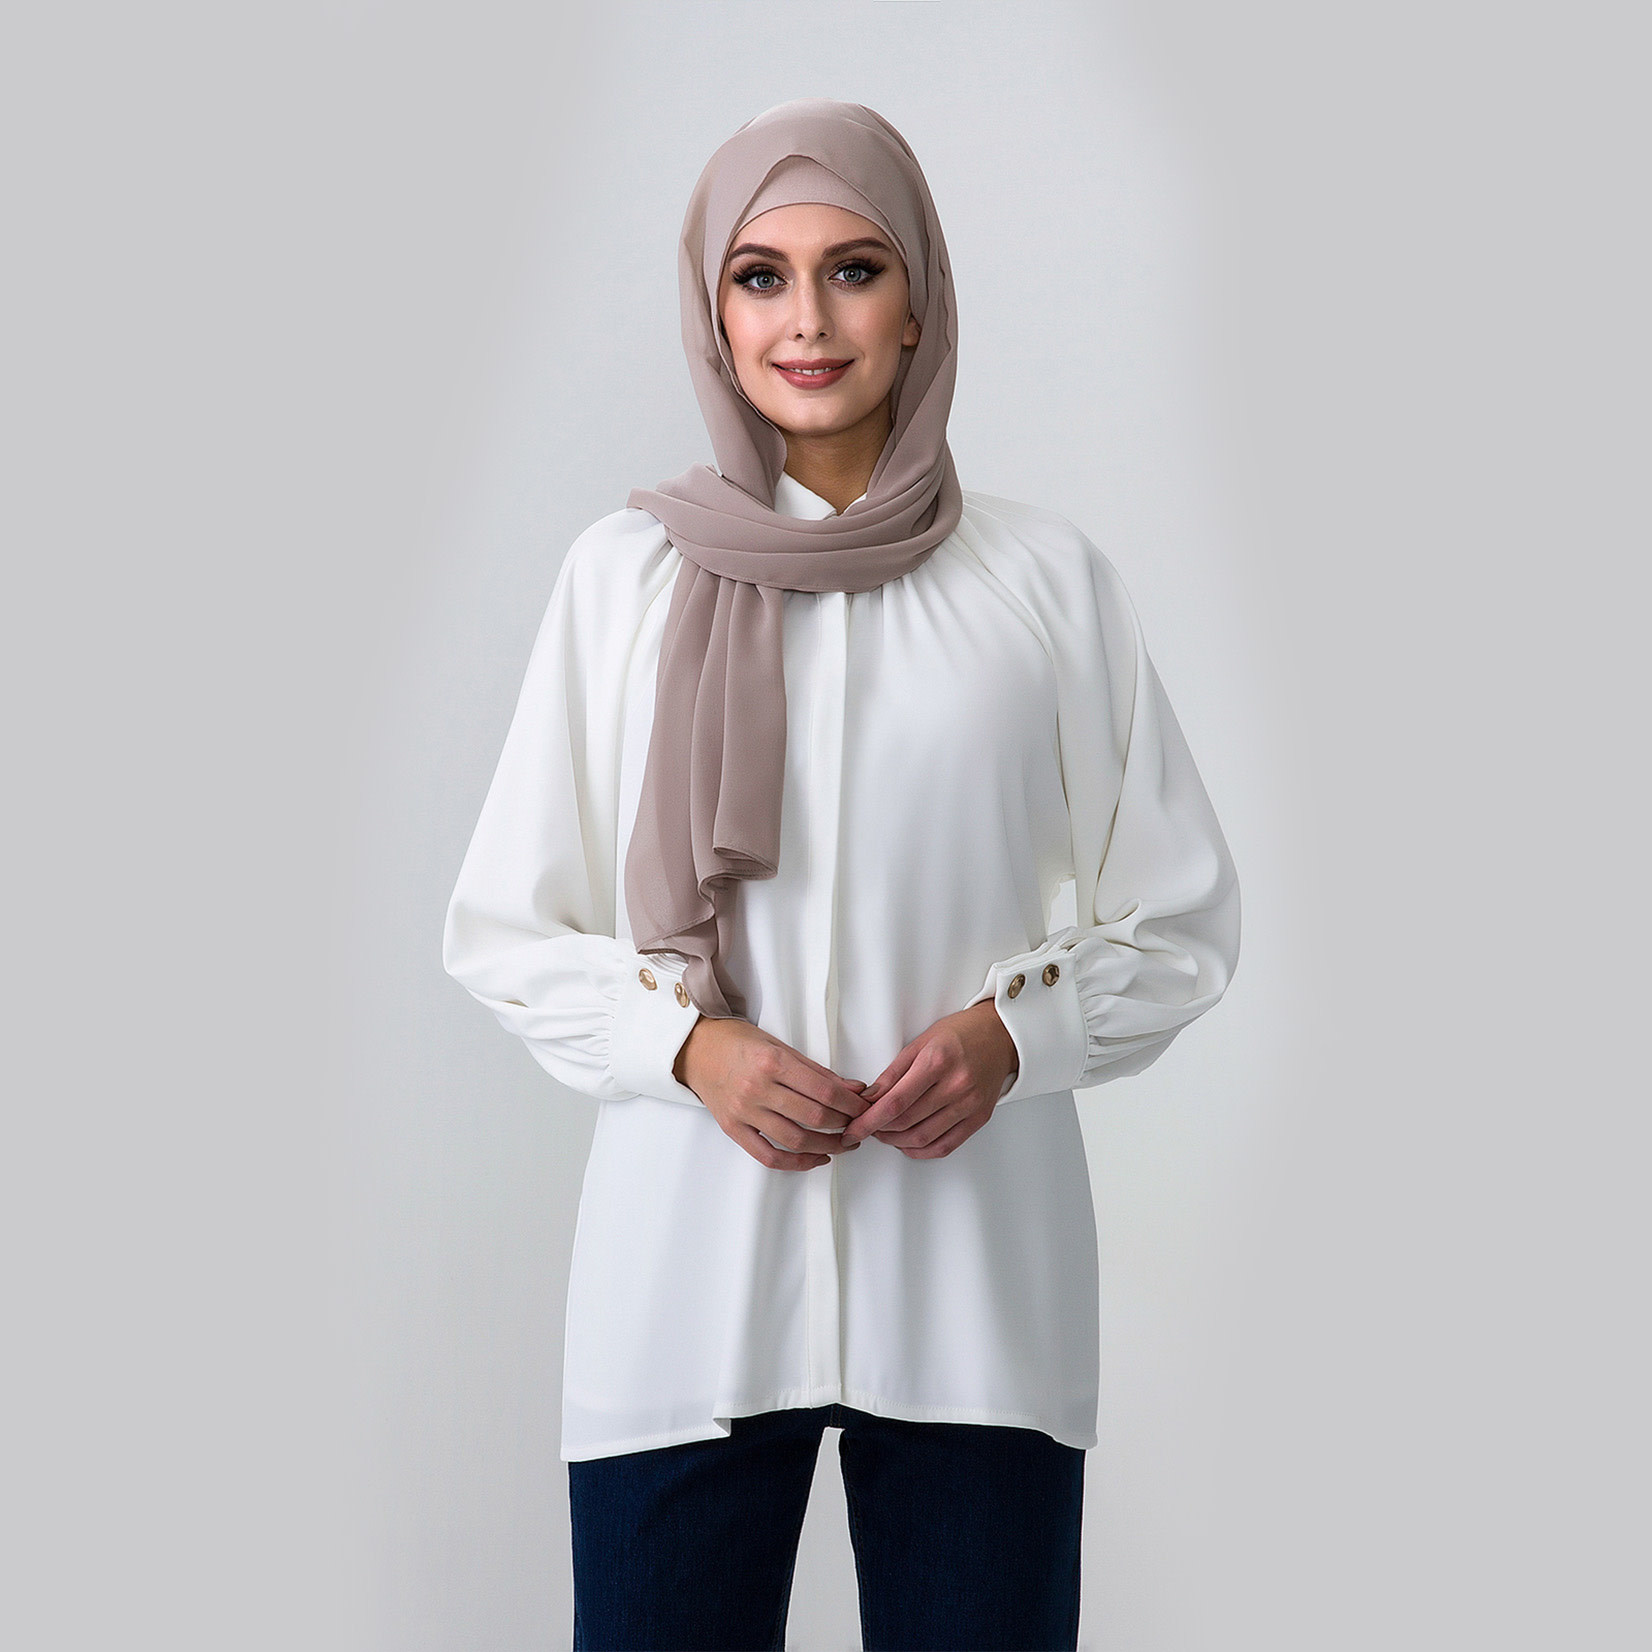 Hijab House White Smock Shirt